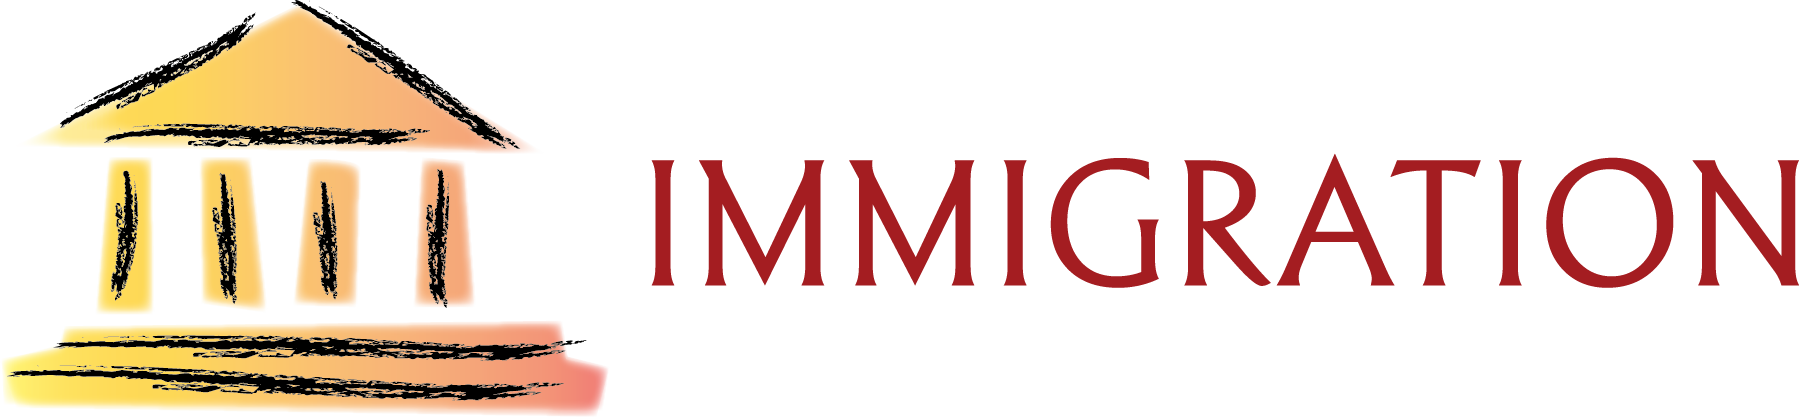 Immigration_Initiative_h_logo